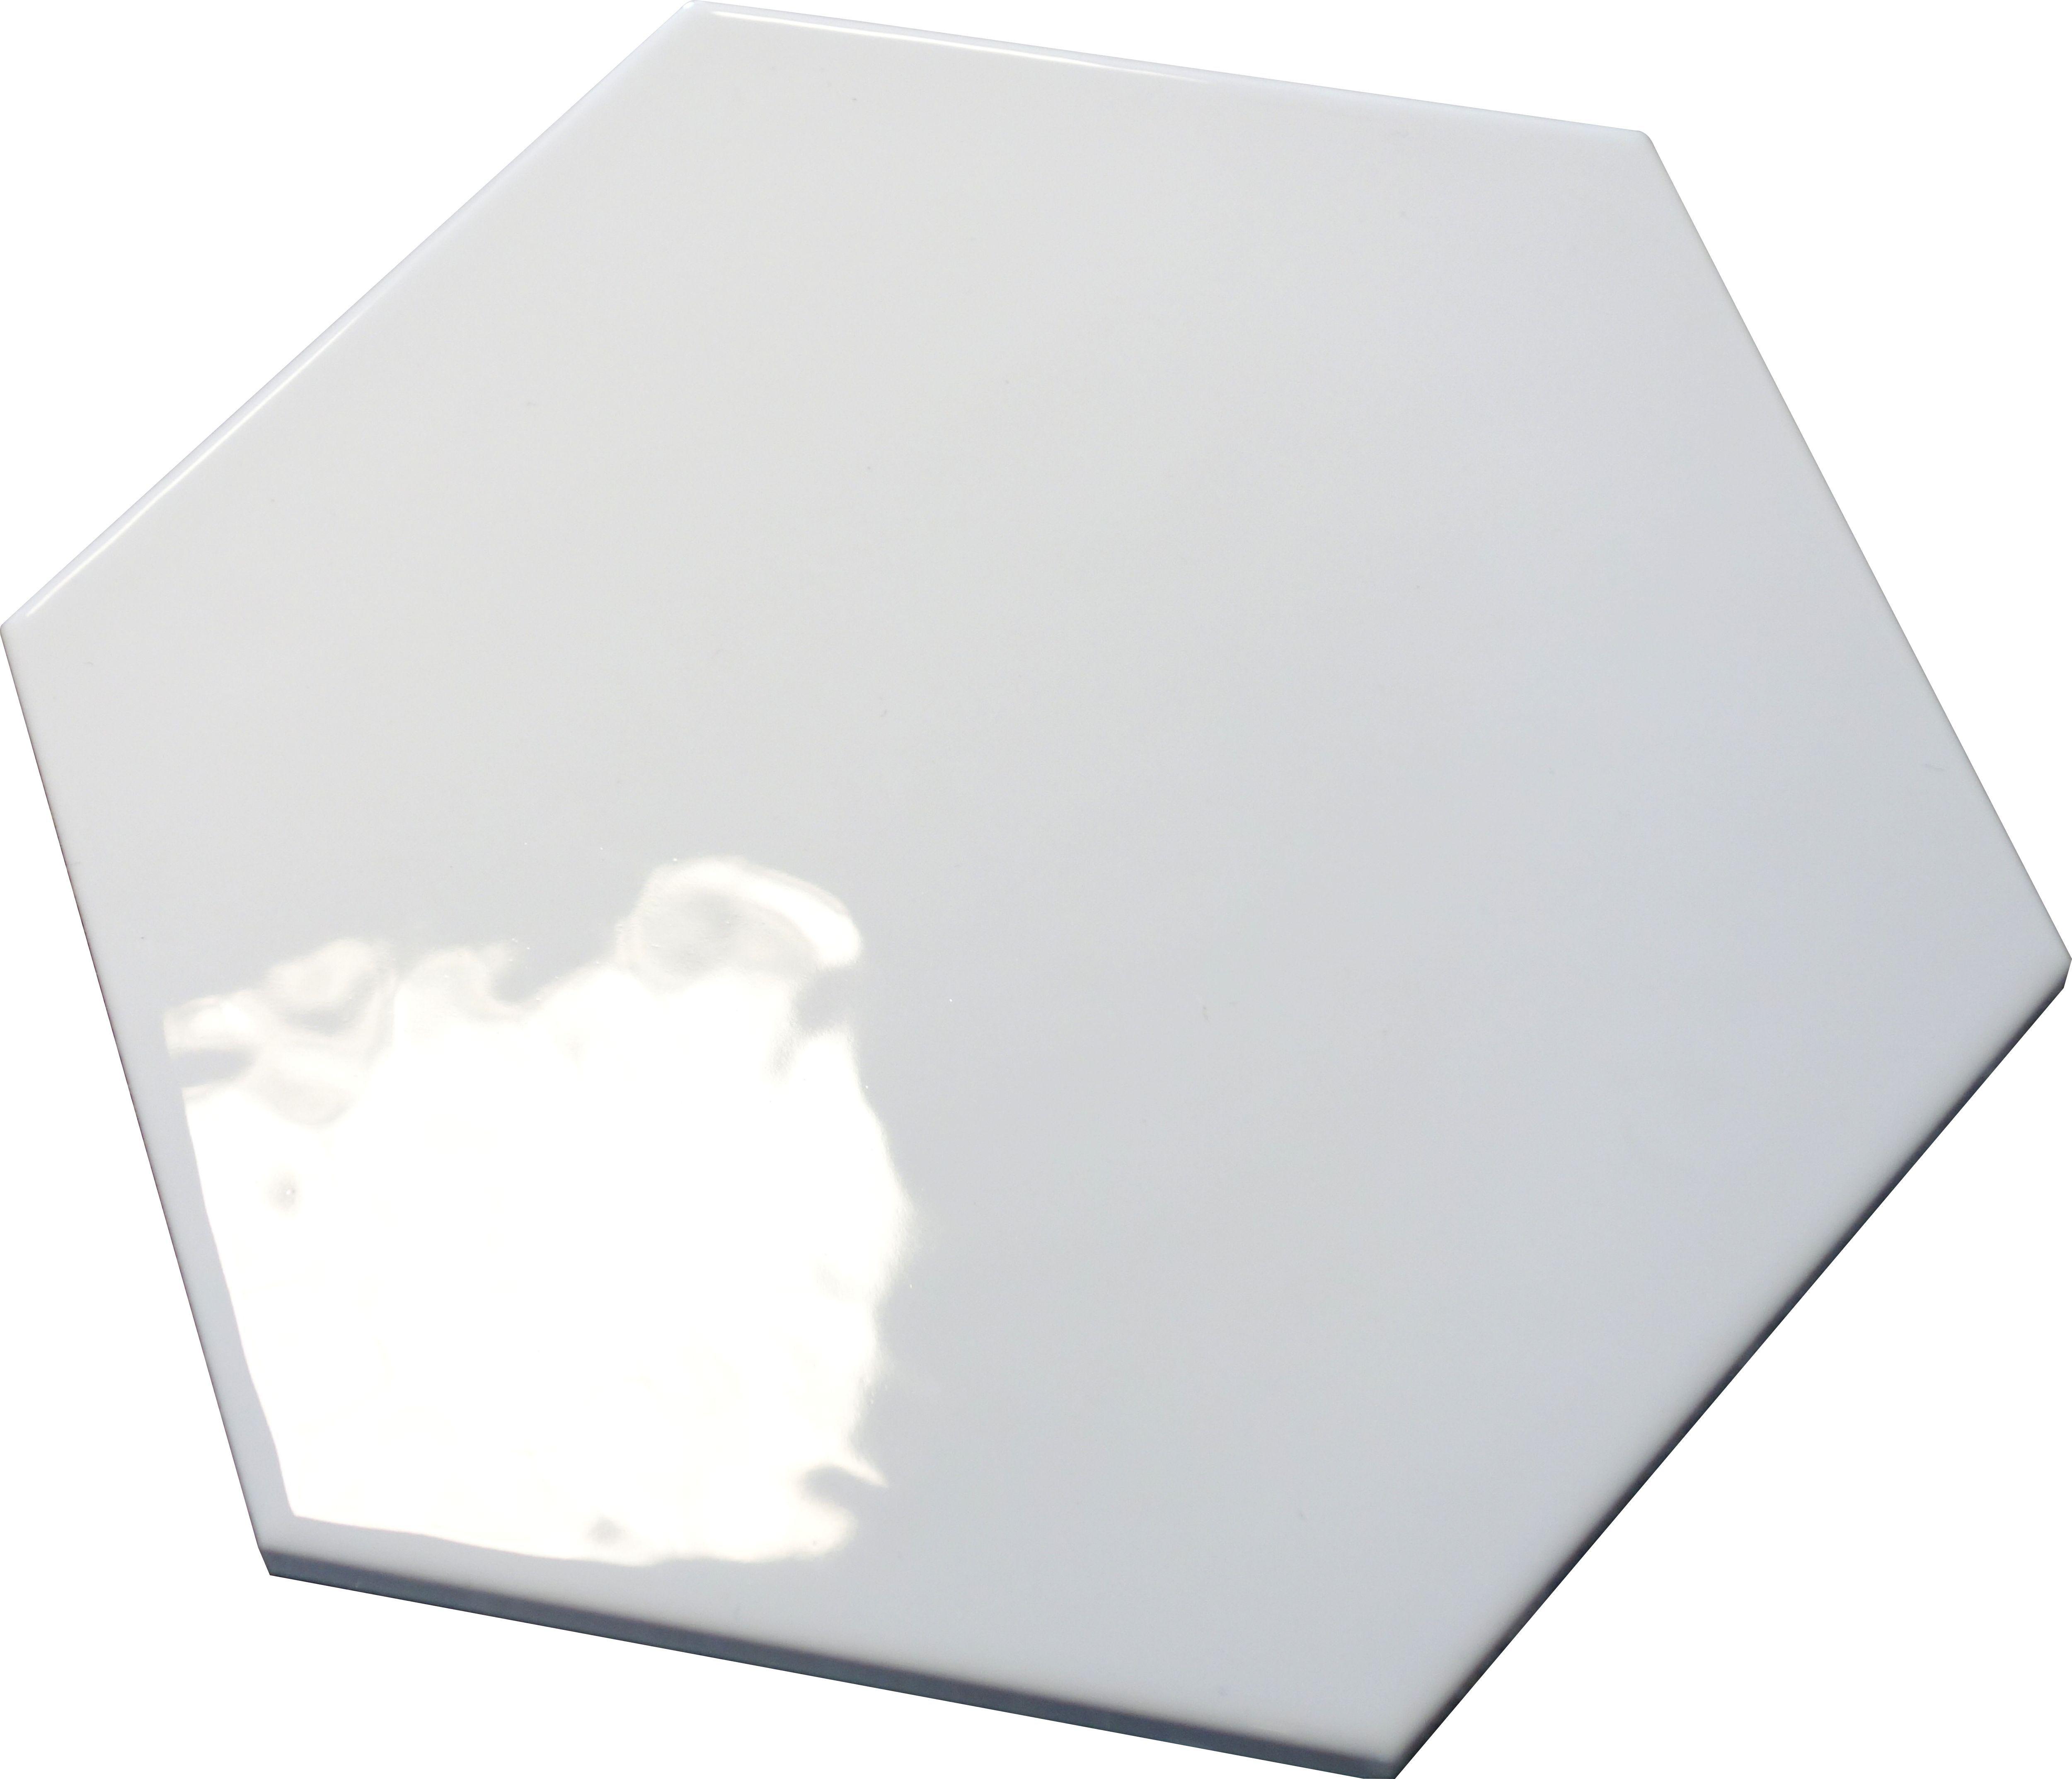 Plytki Heksagonalne Biale 20x17 Kaflando Pl Blanco Hexa Computer